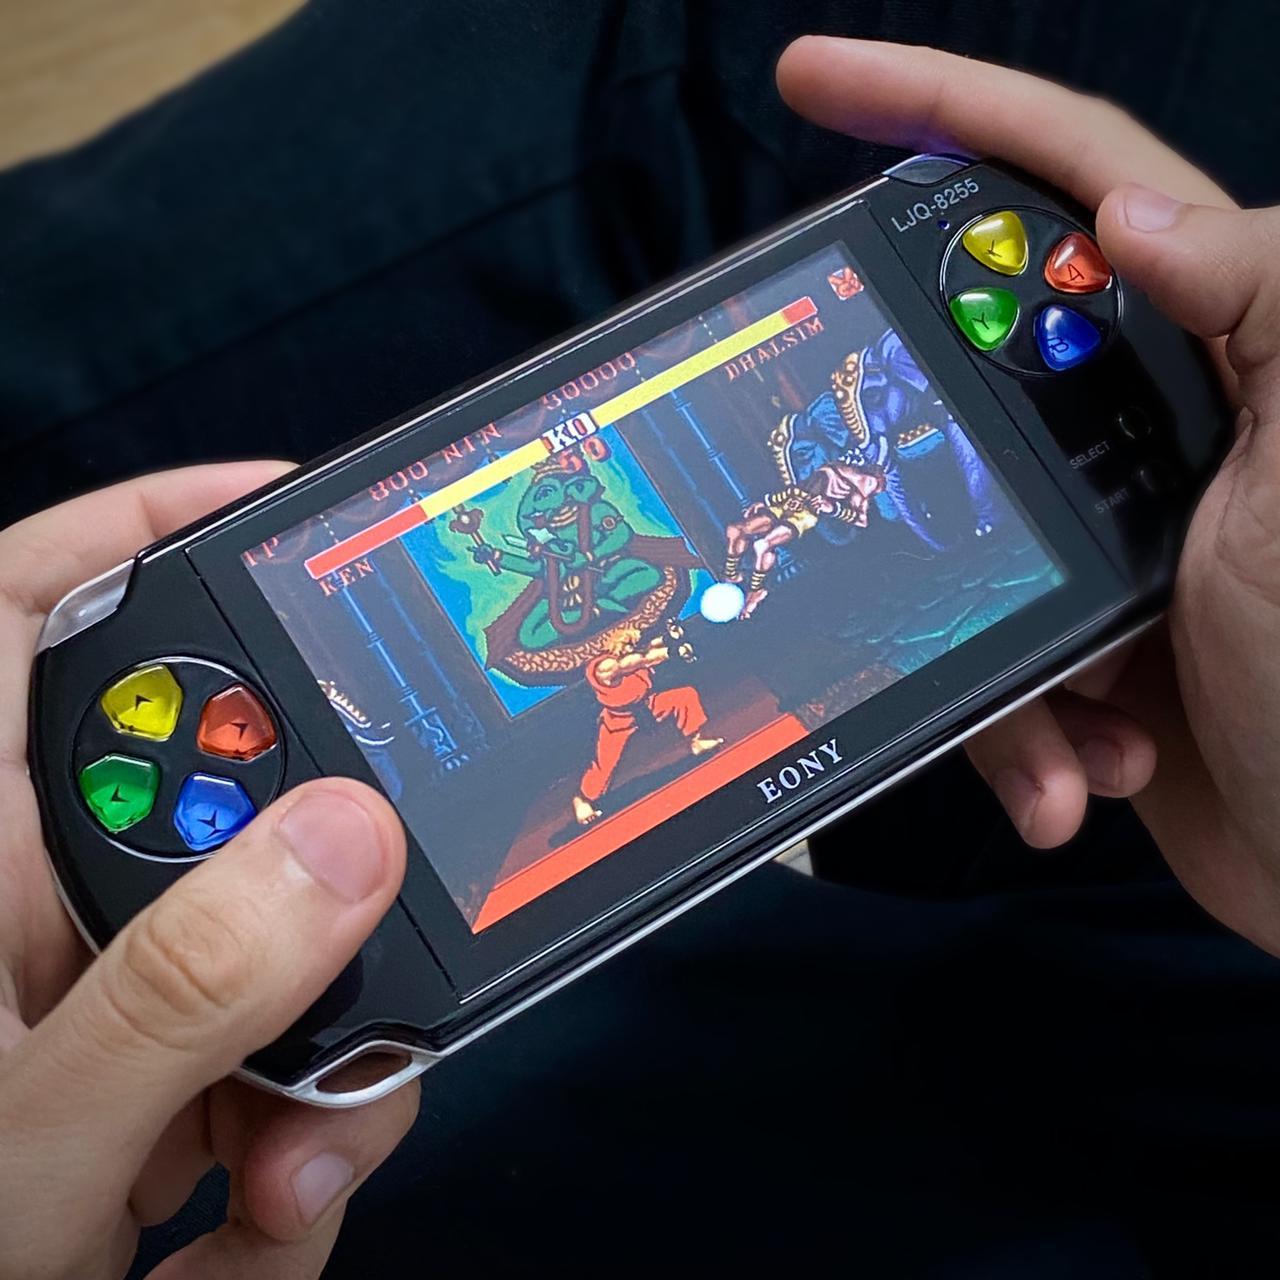 Video Game Retro Portatil: Psp Jogo Nes Mini Fliperama Tela 5.1 ( Preto ) - Eony